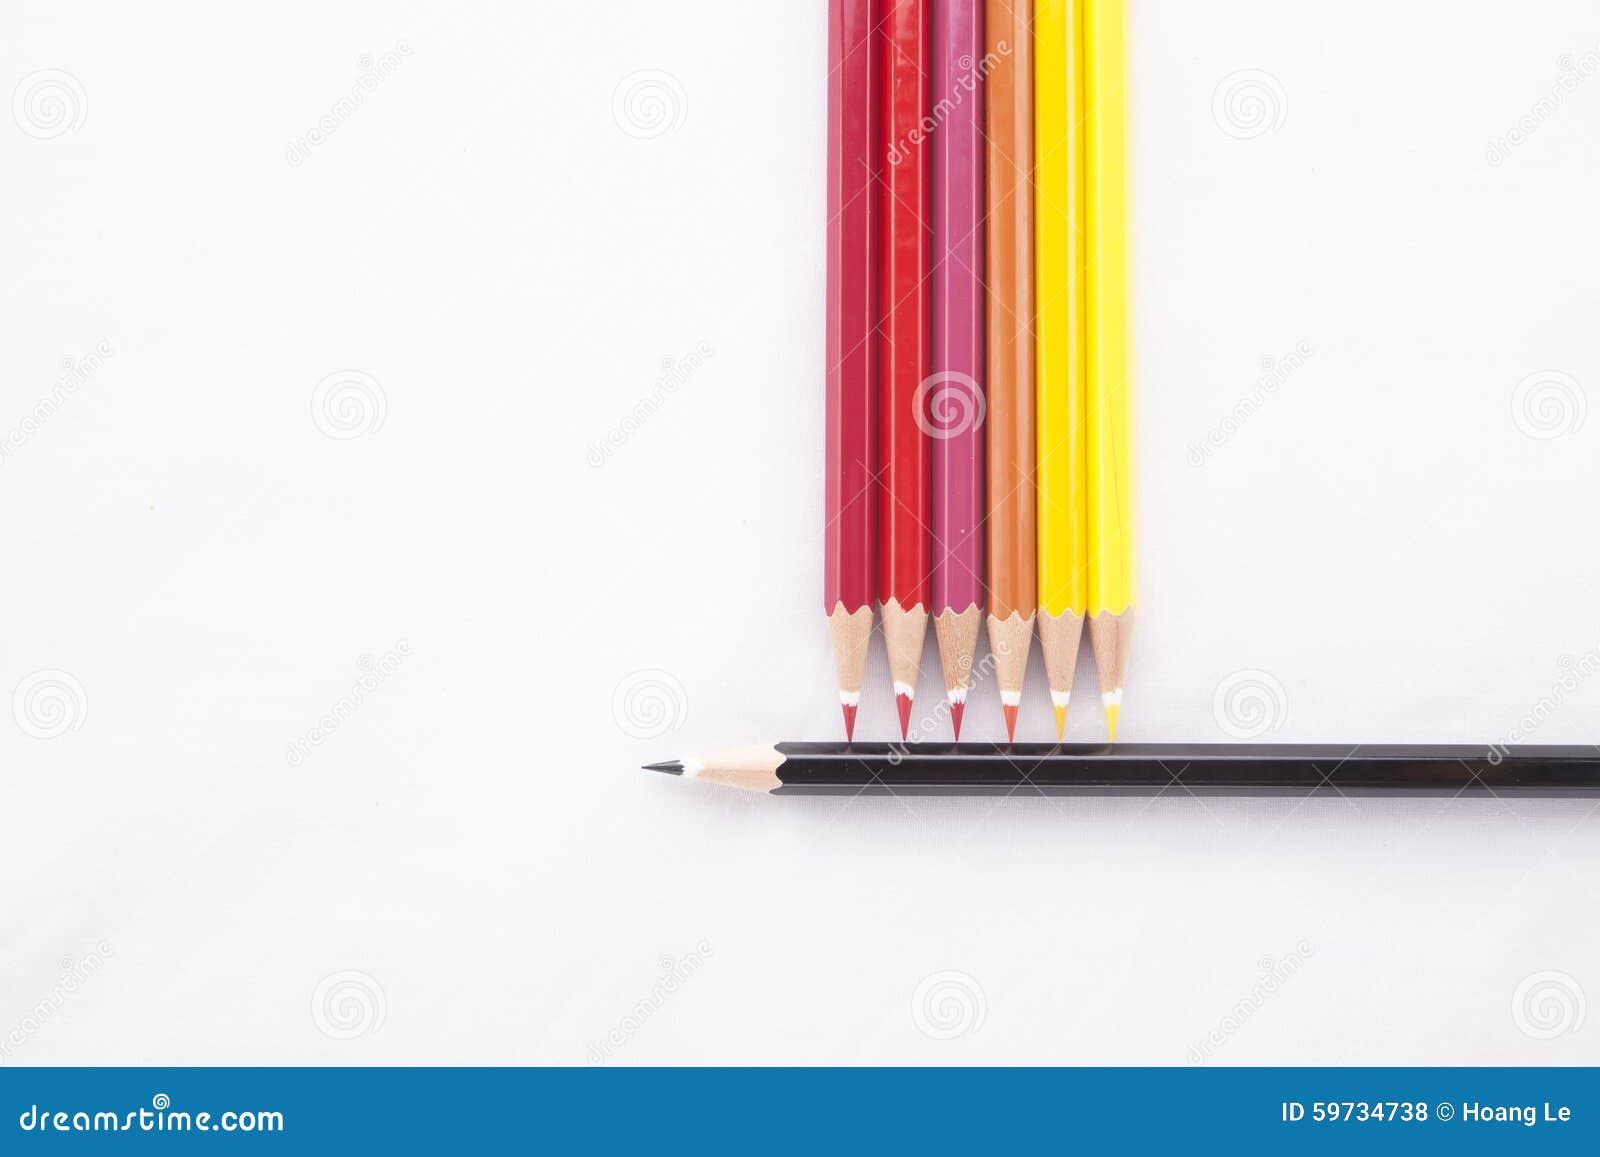 Färgblyertspennor på vit bakgrund